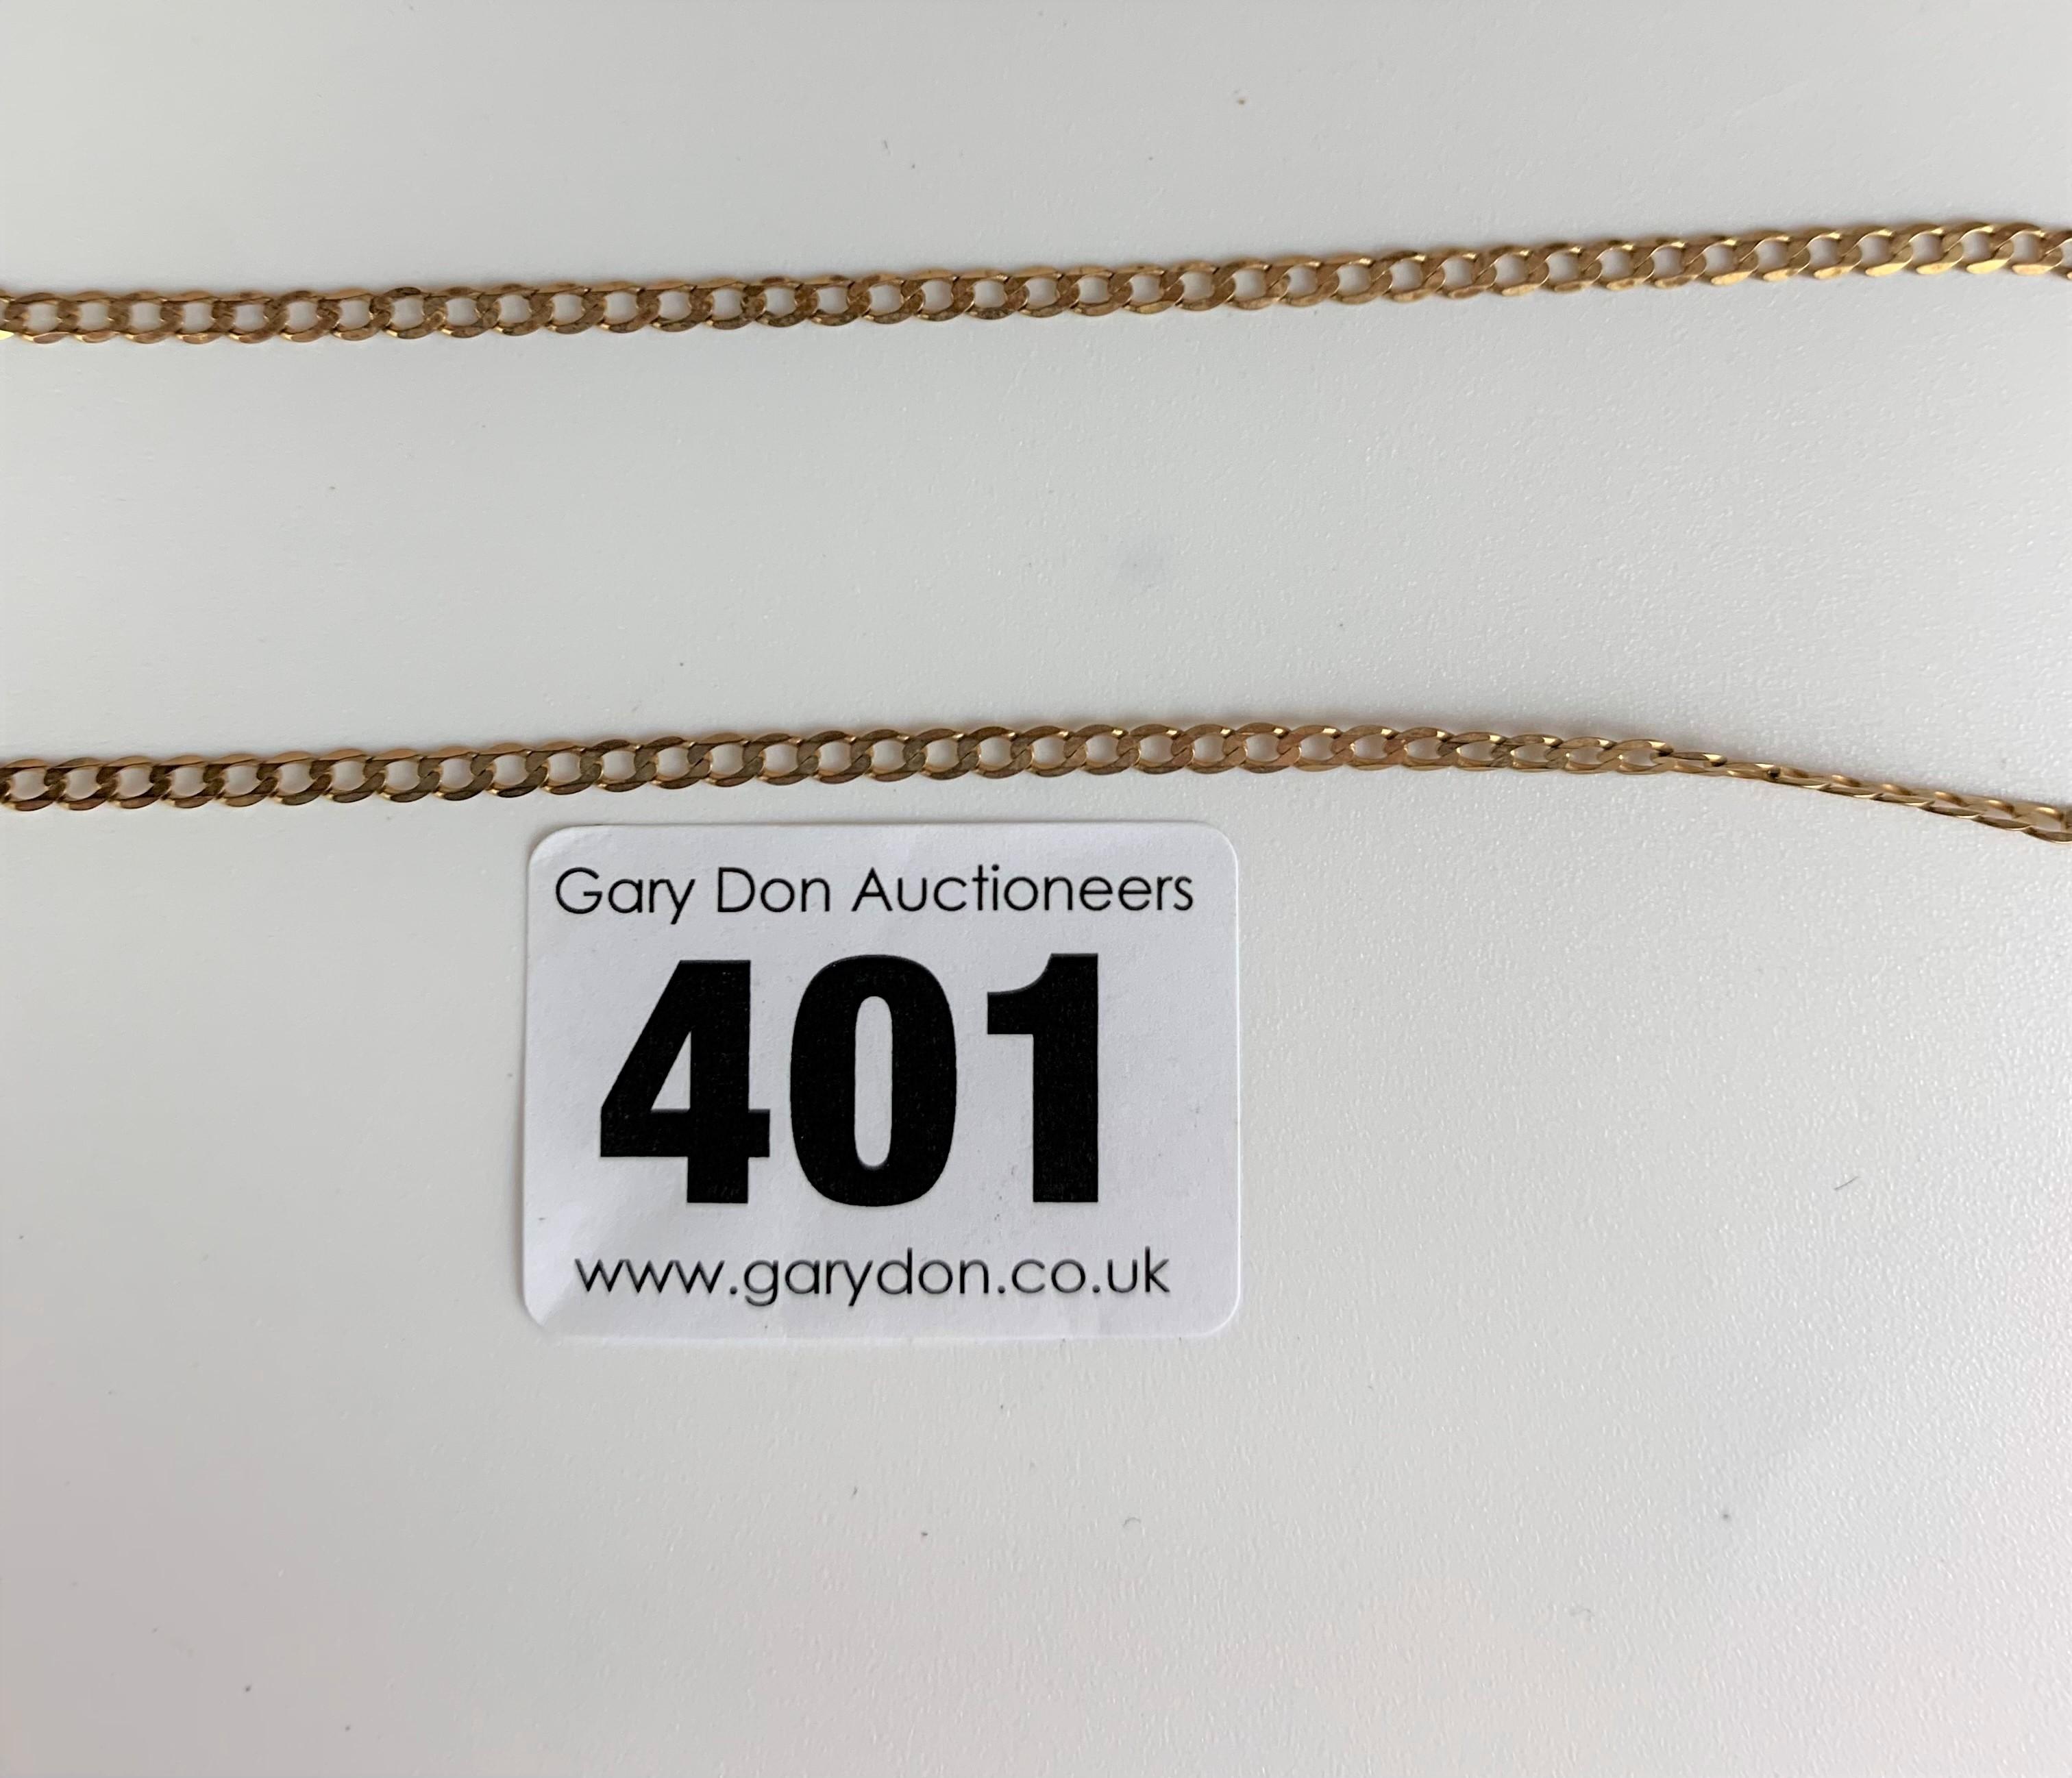 "9k gold necklace, length 20"", w: 2.5 gms - Image 2 of 3"